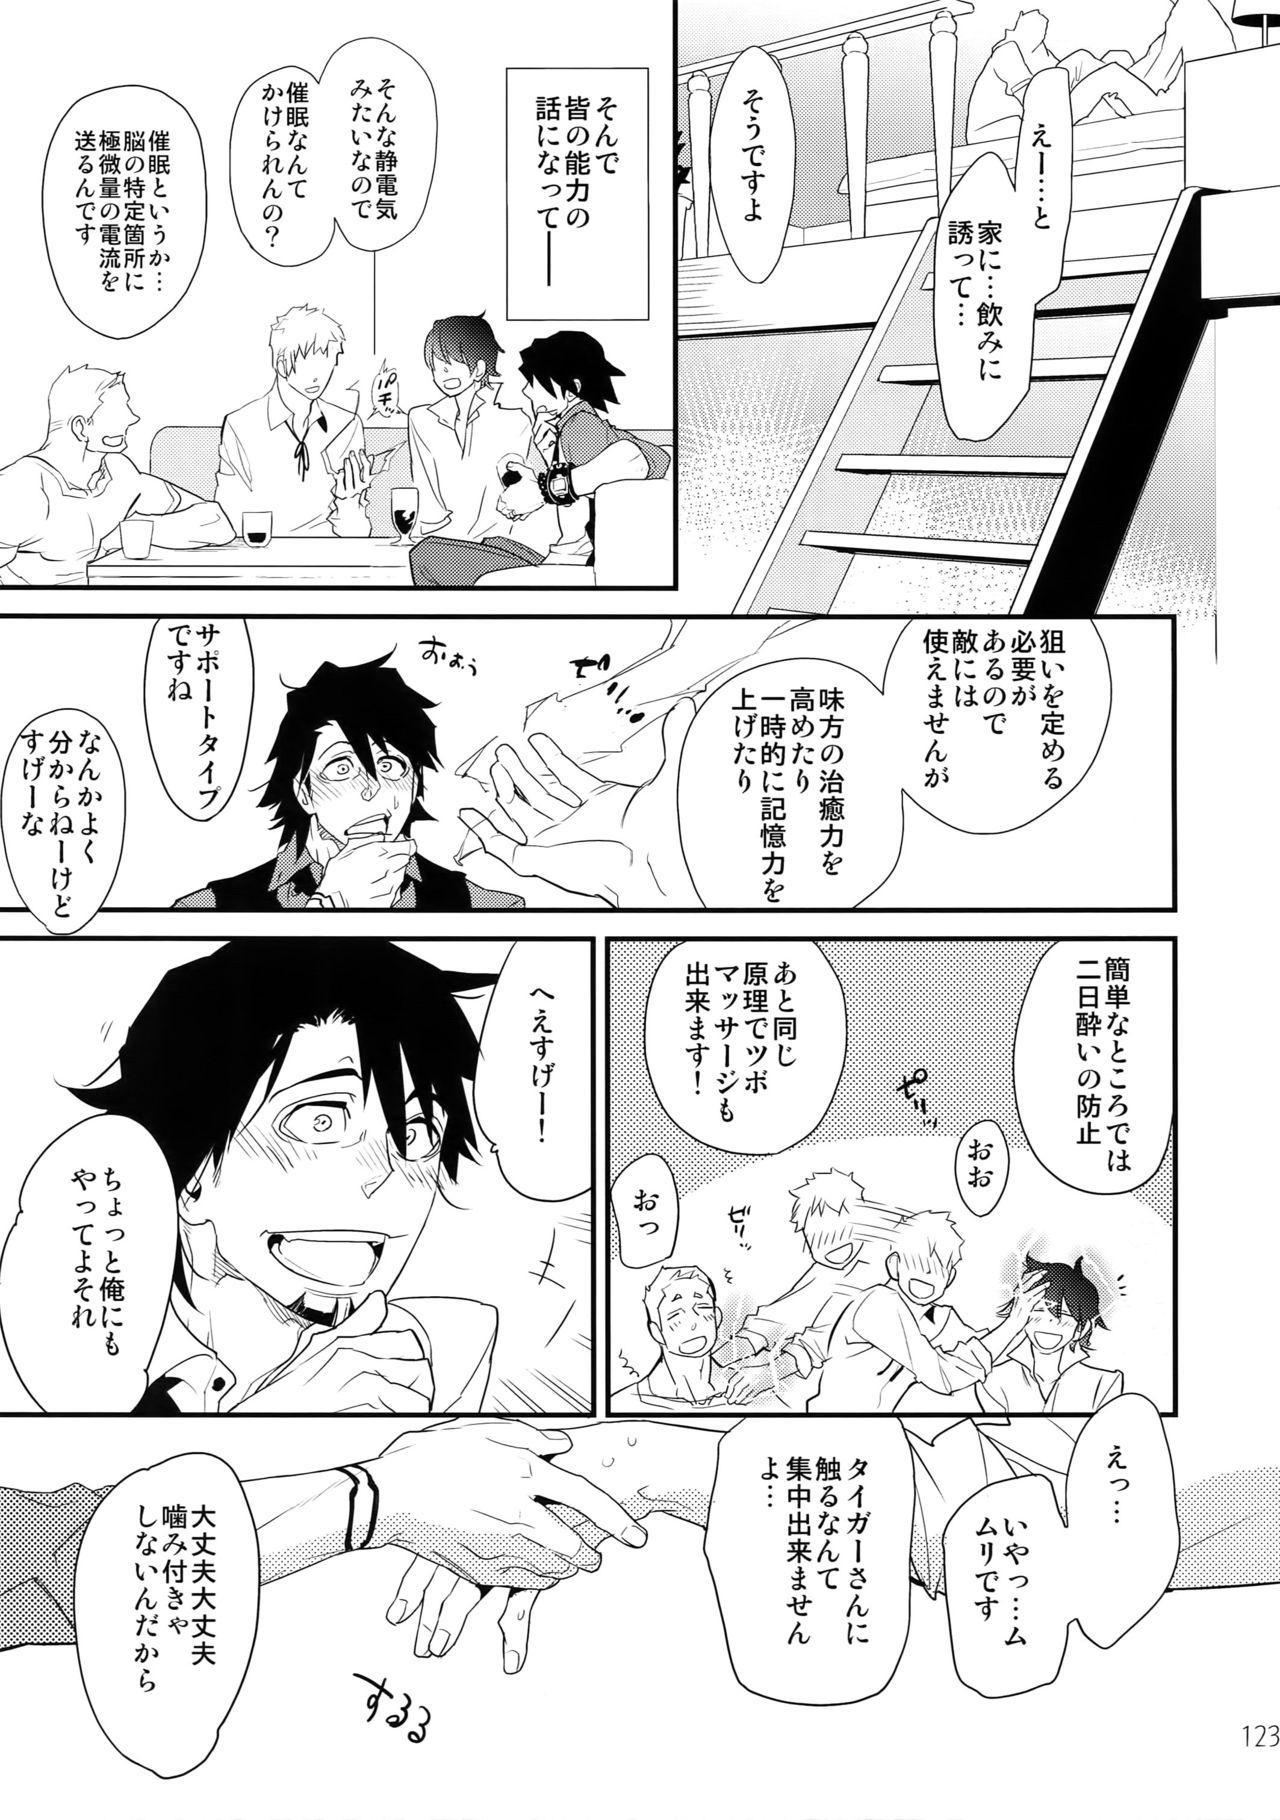 T&B Sairoku! 2 121